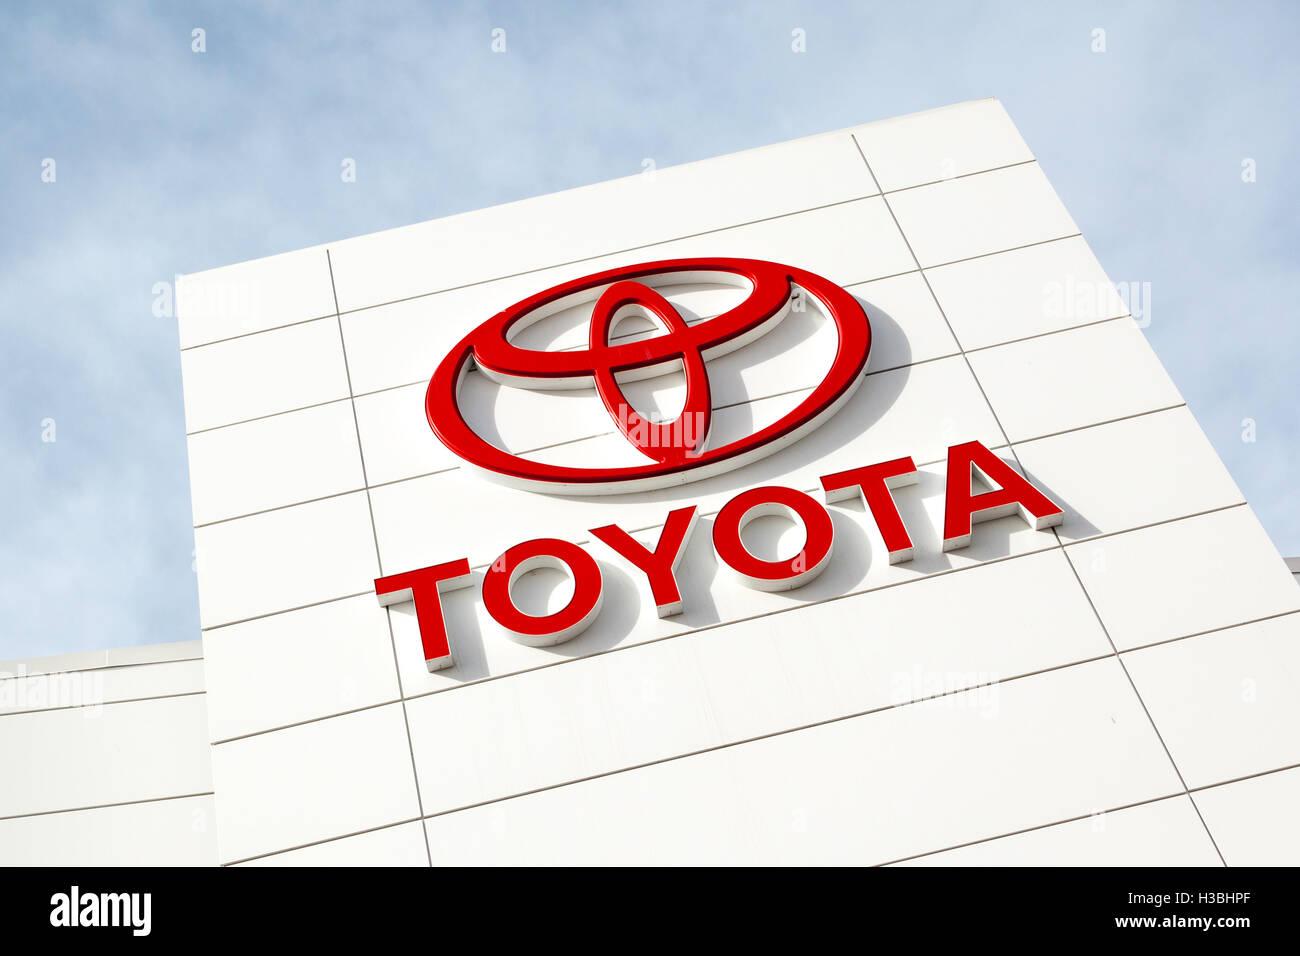 Stock symbol for toyota motor corporation impremedia stock symbol for toyota motor corporation impremedia buycottarizona Gallery